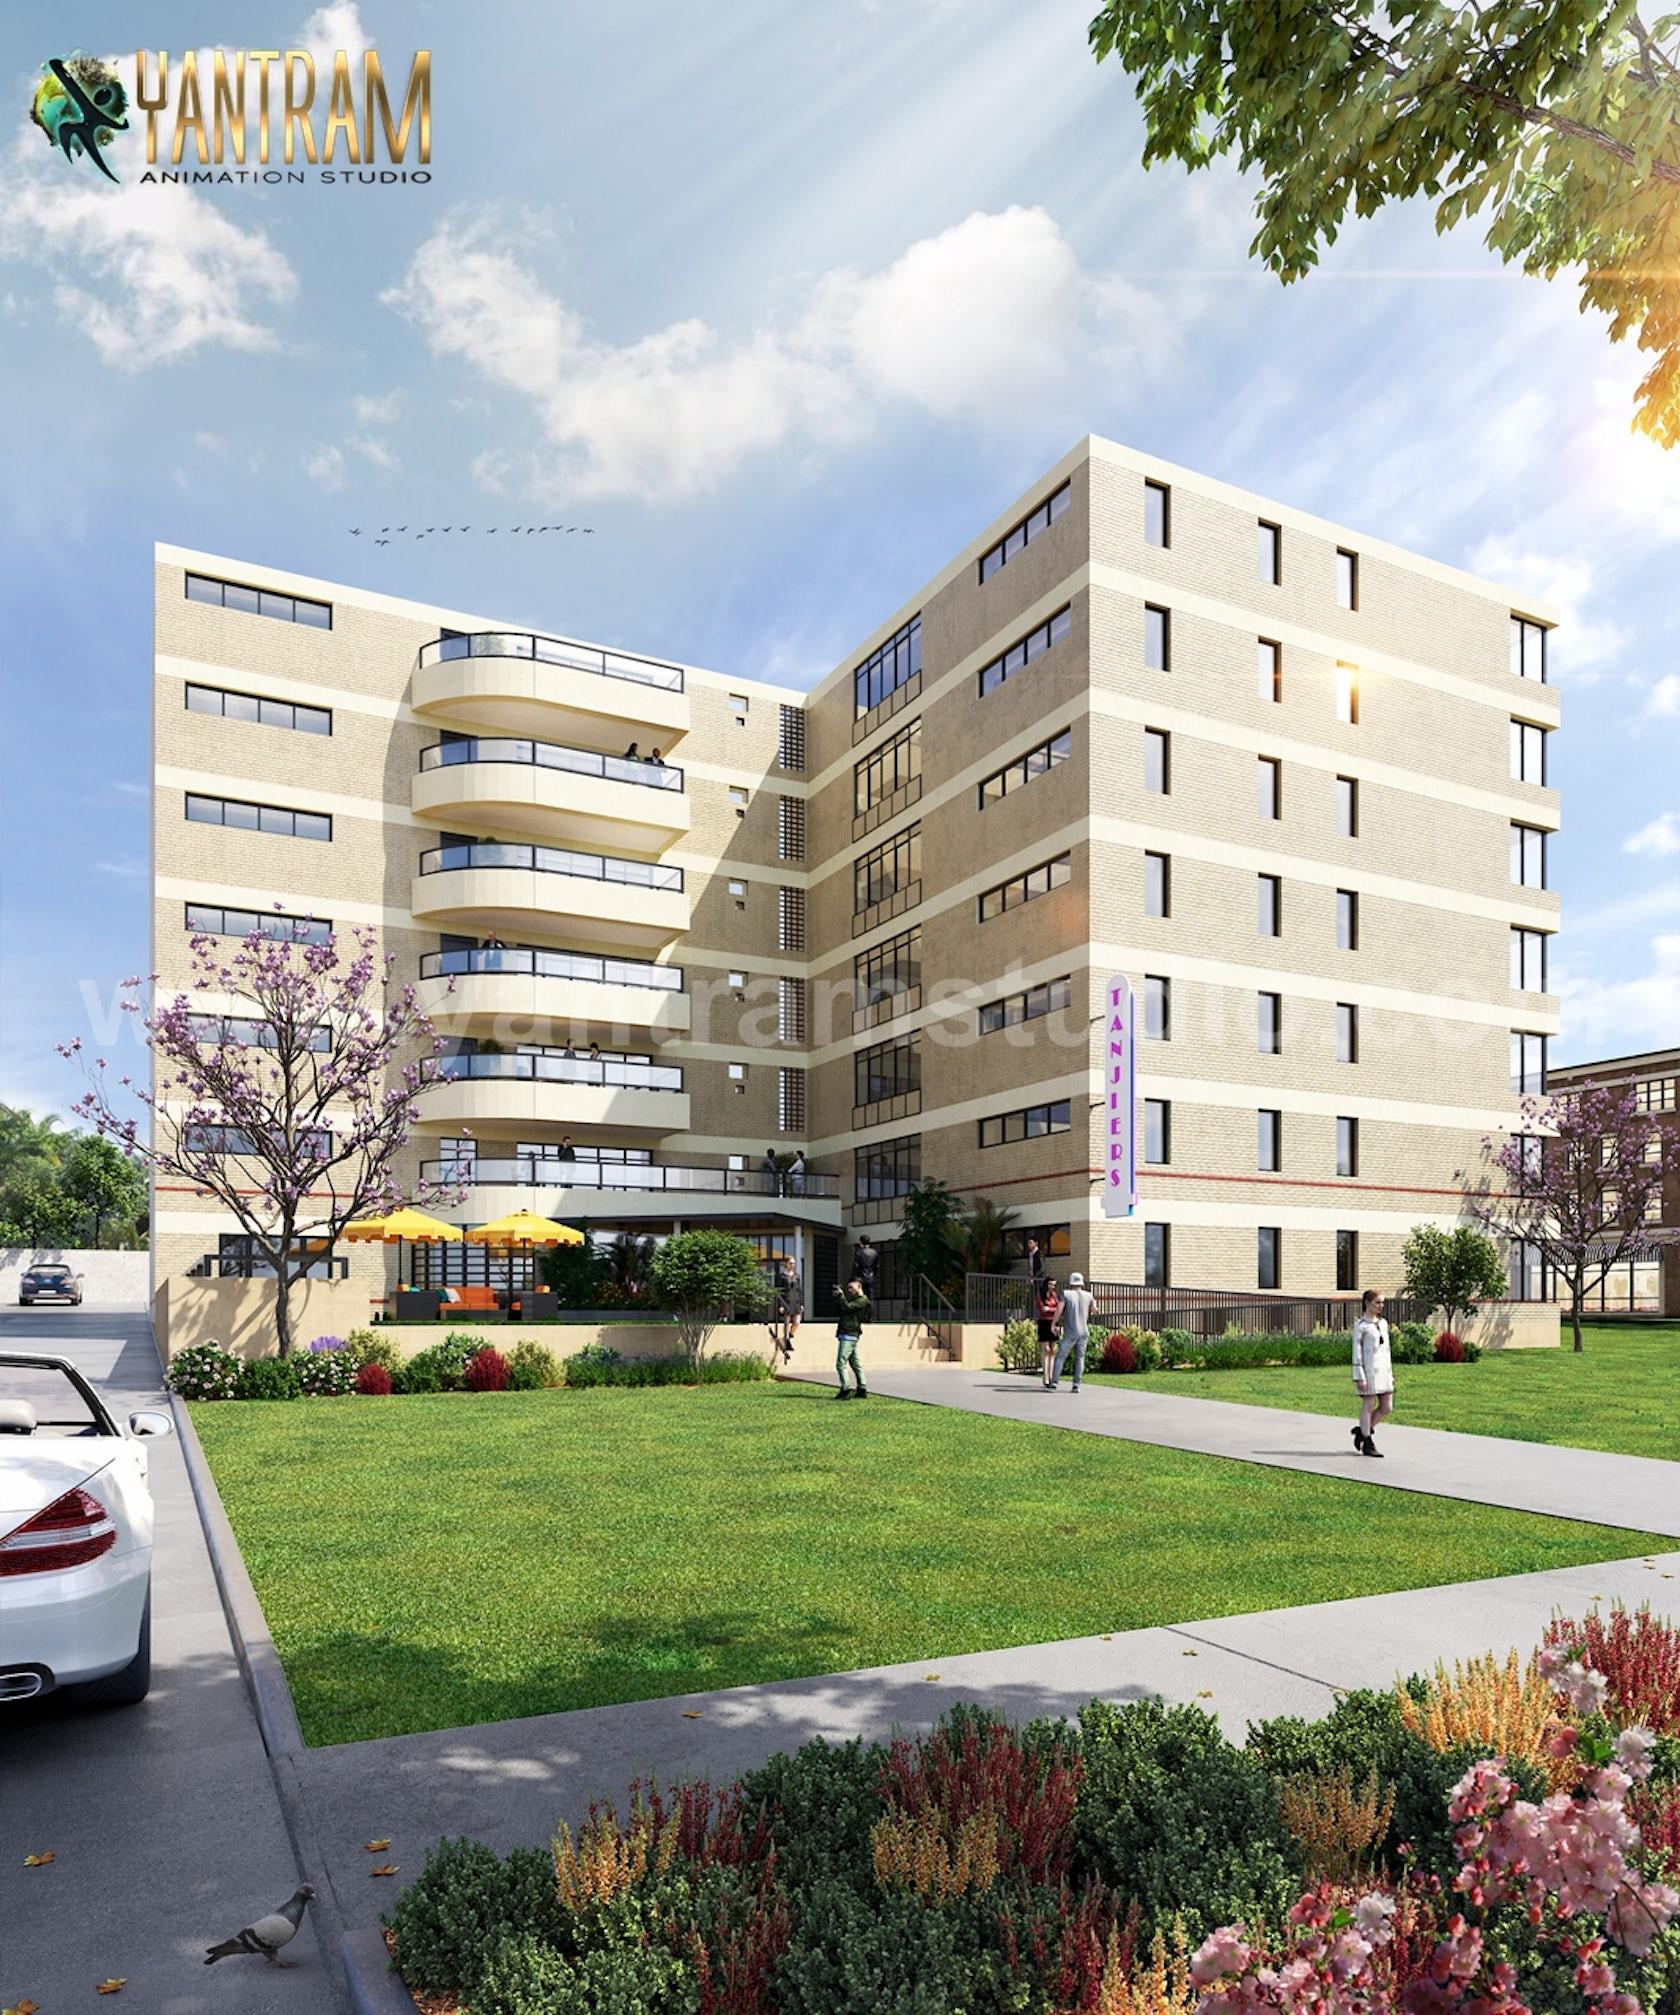 Modern Exterior Interior Apartment Building Design Ideas By Architectural Exterior Visualization Design Company Architizer